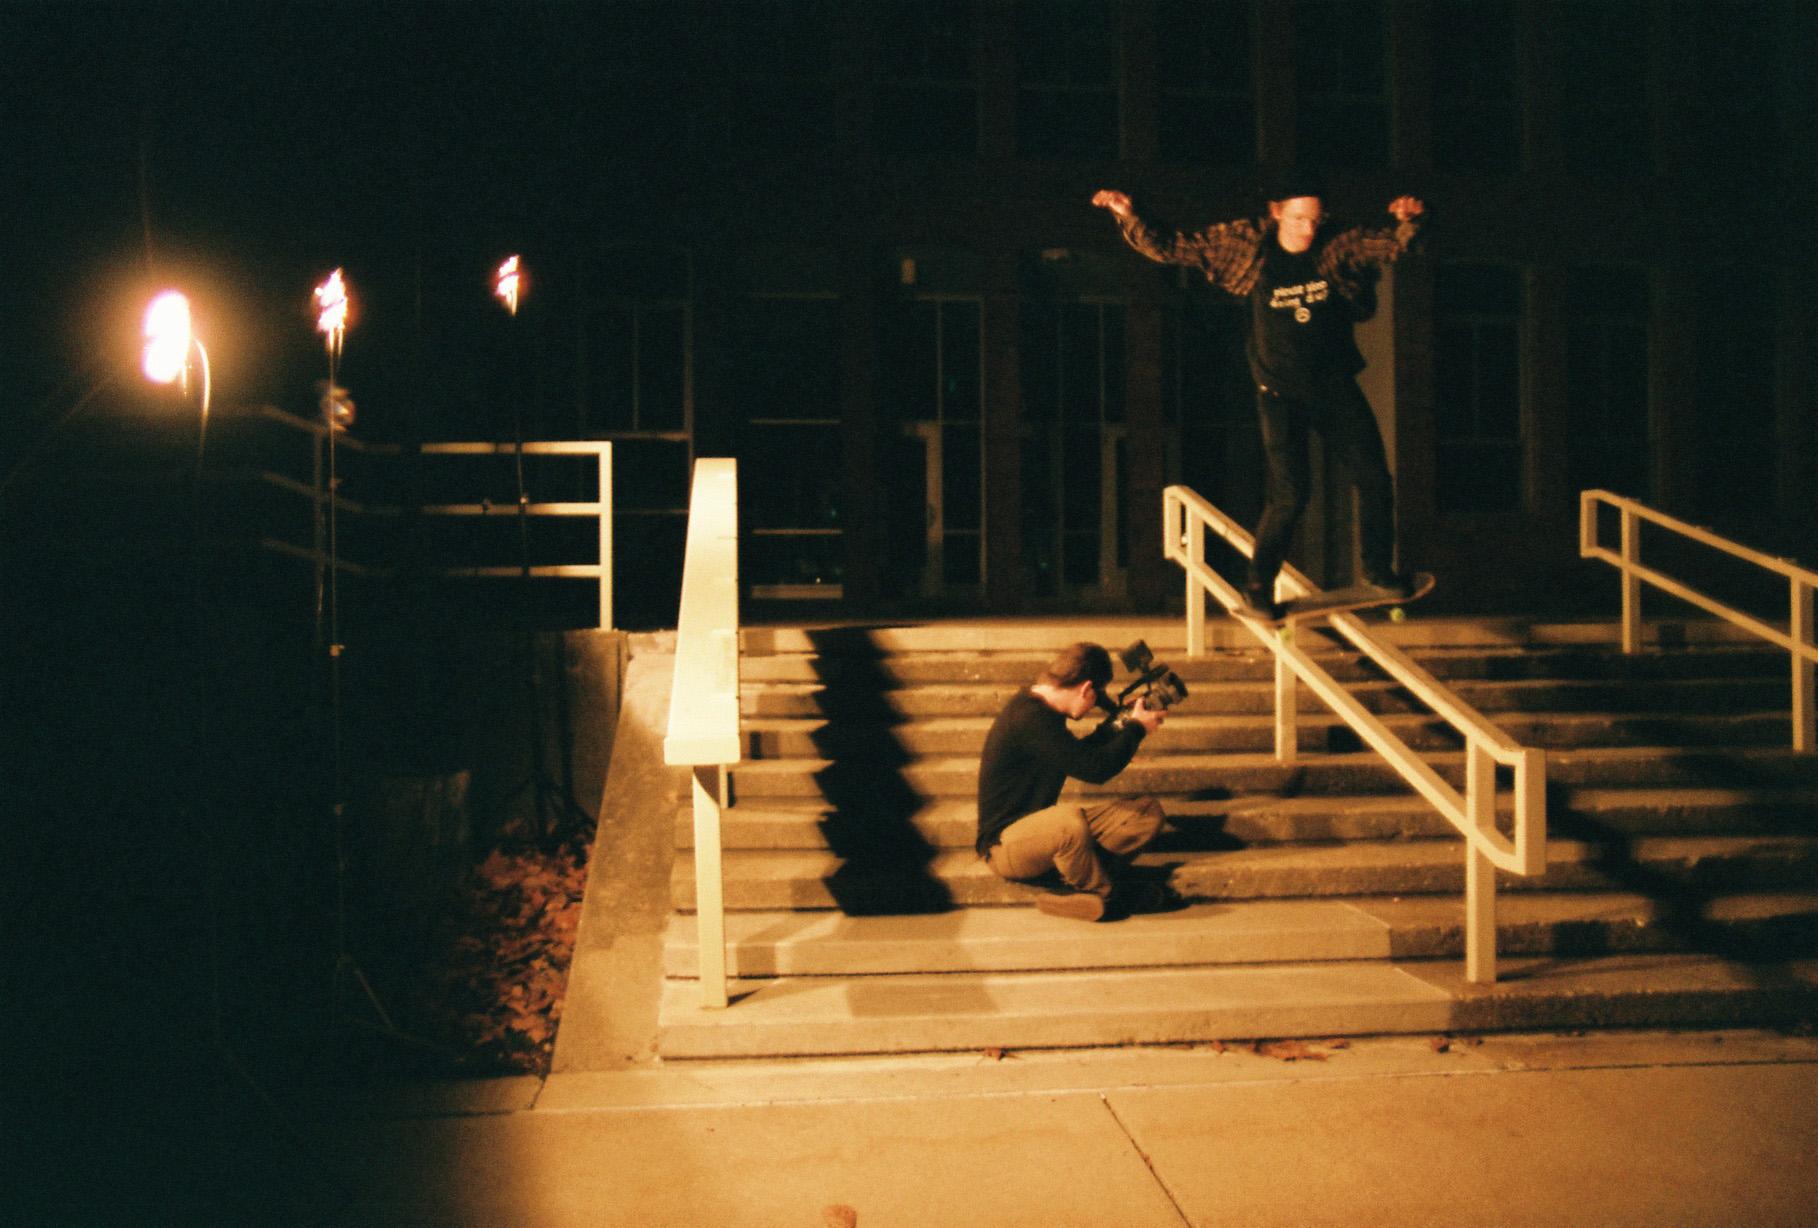 Brandon Bowes, boardslide. Columbus, IN.